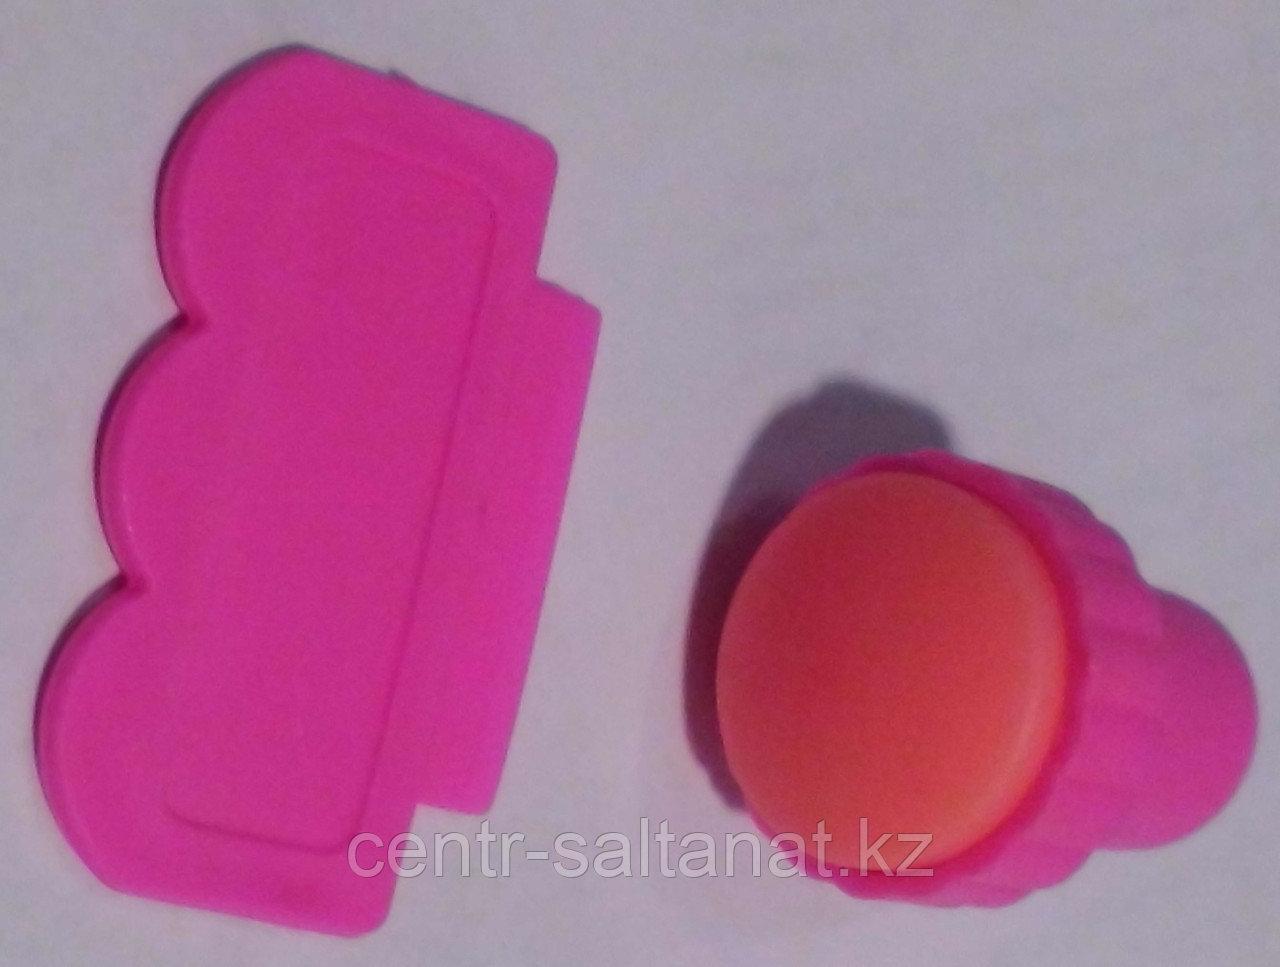 Штамп для дизайна ногтей